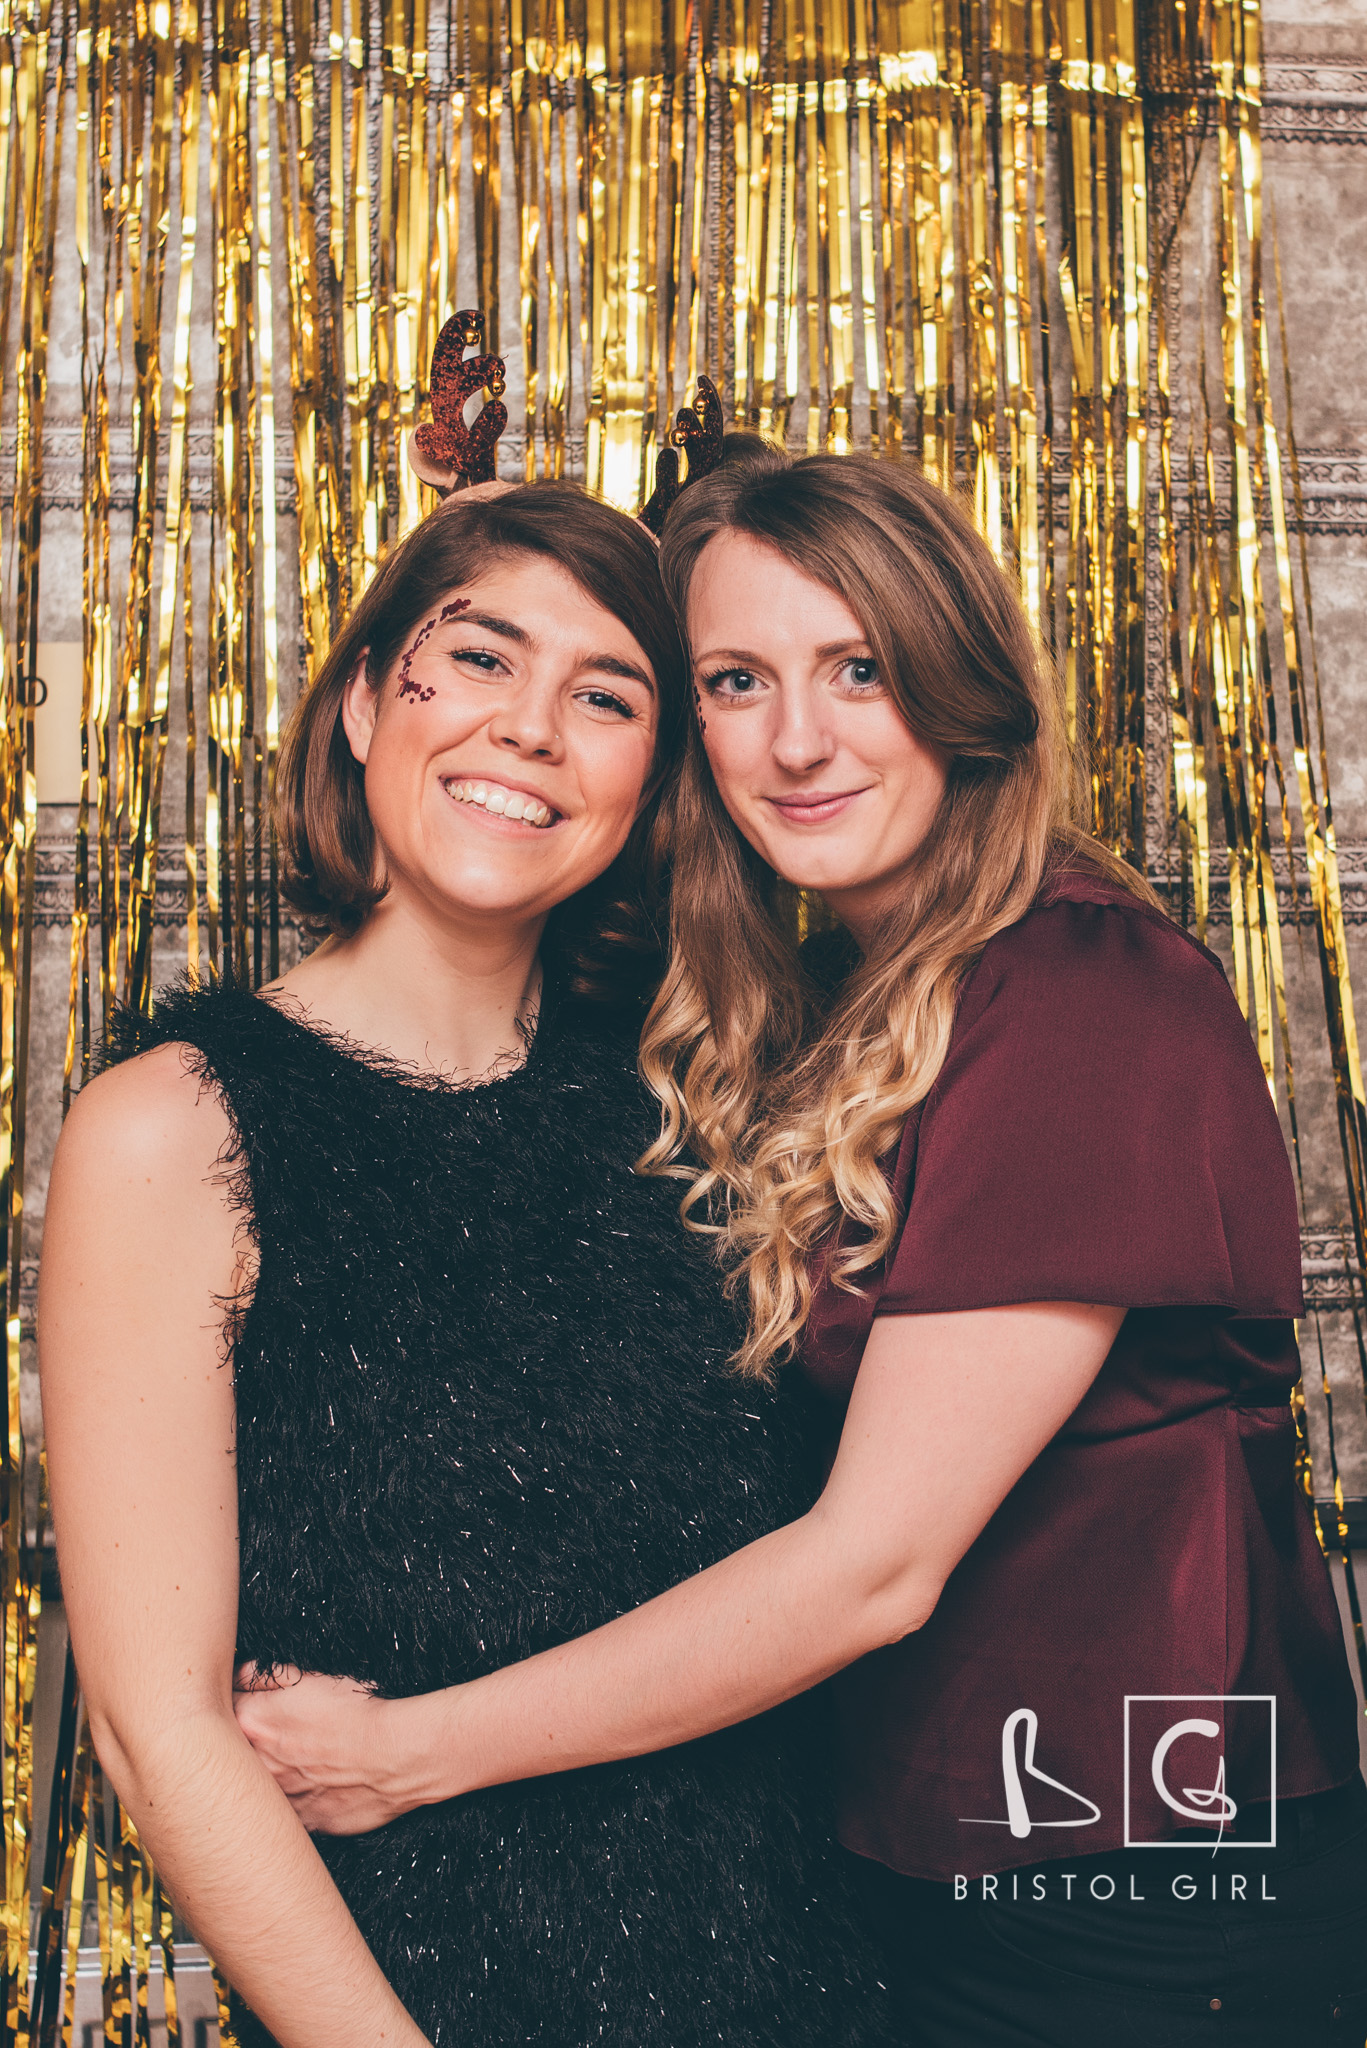 Bristol-Girl-Christmas-Party-City-Girl-Network-15.jpg